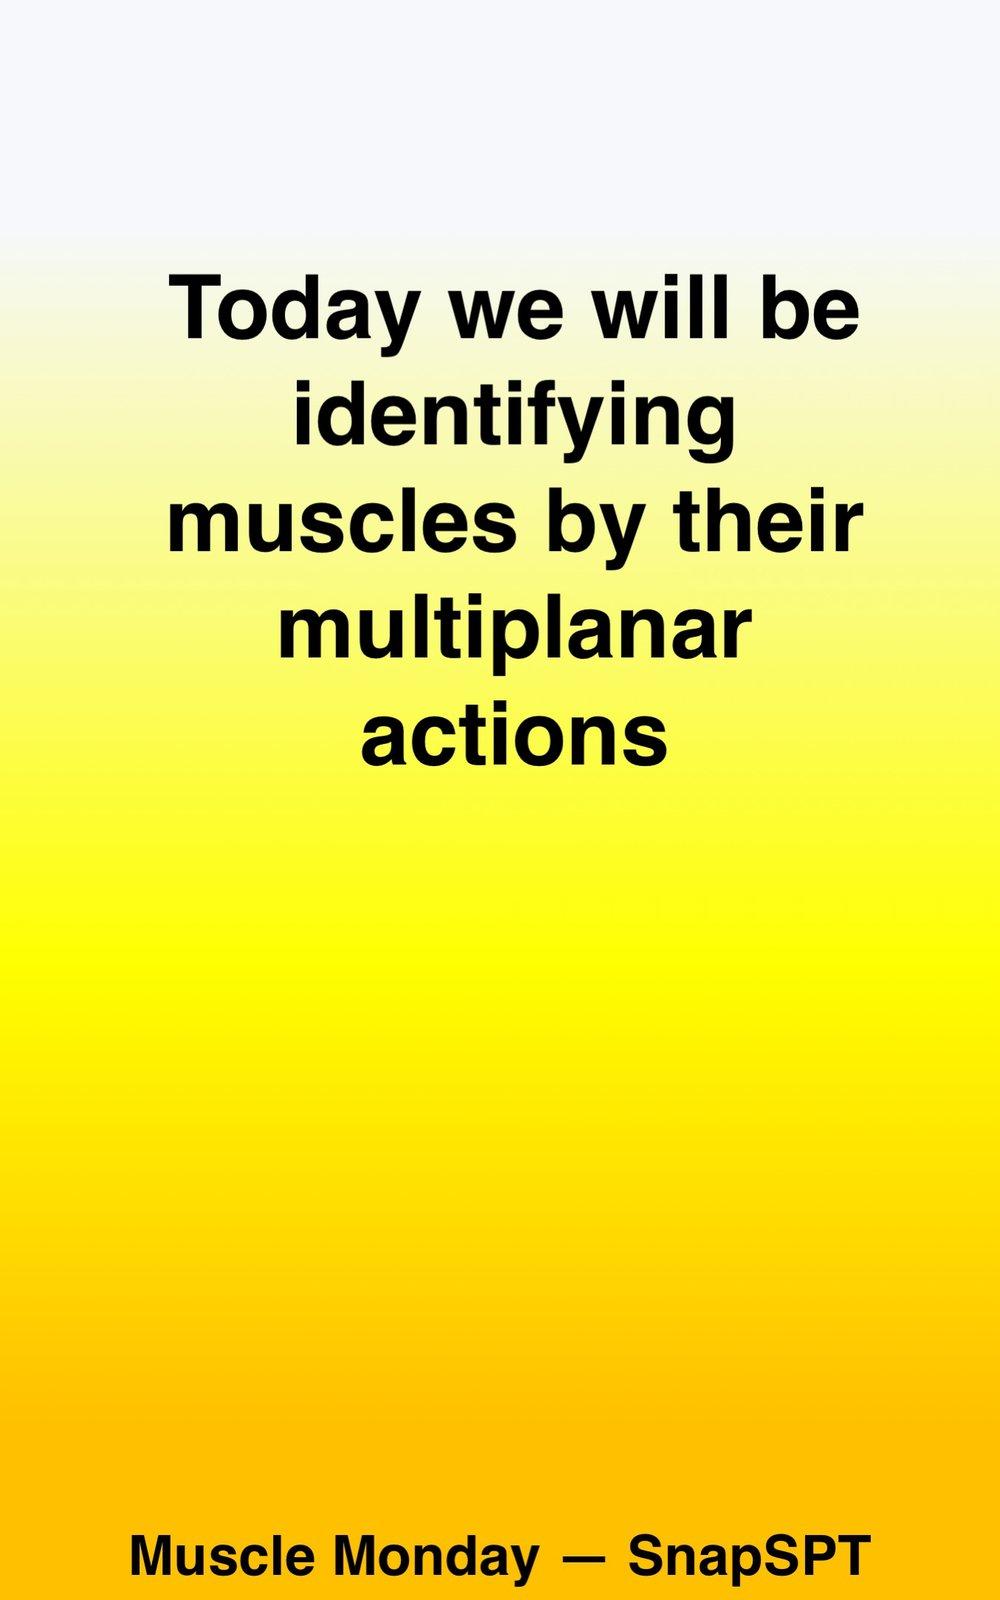 MuscleActions02.jpg